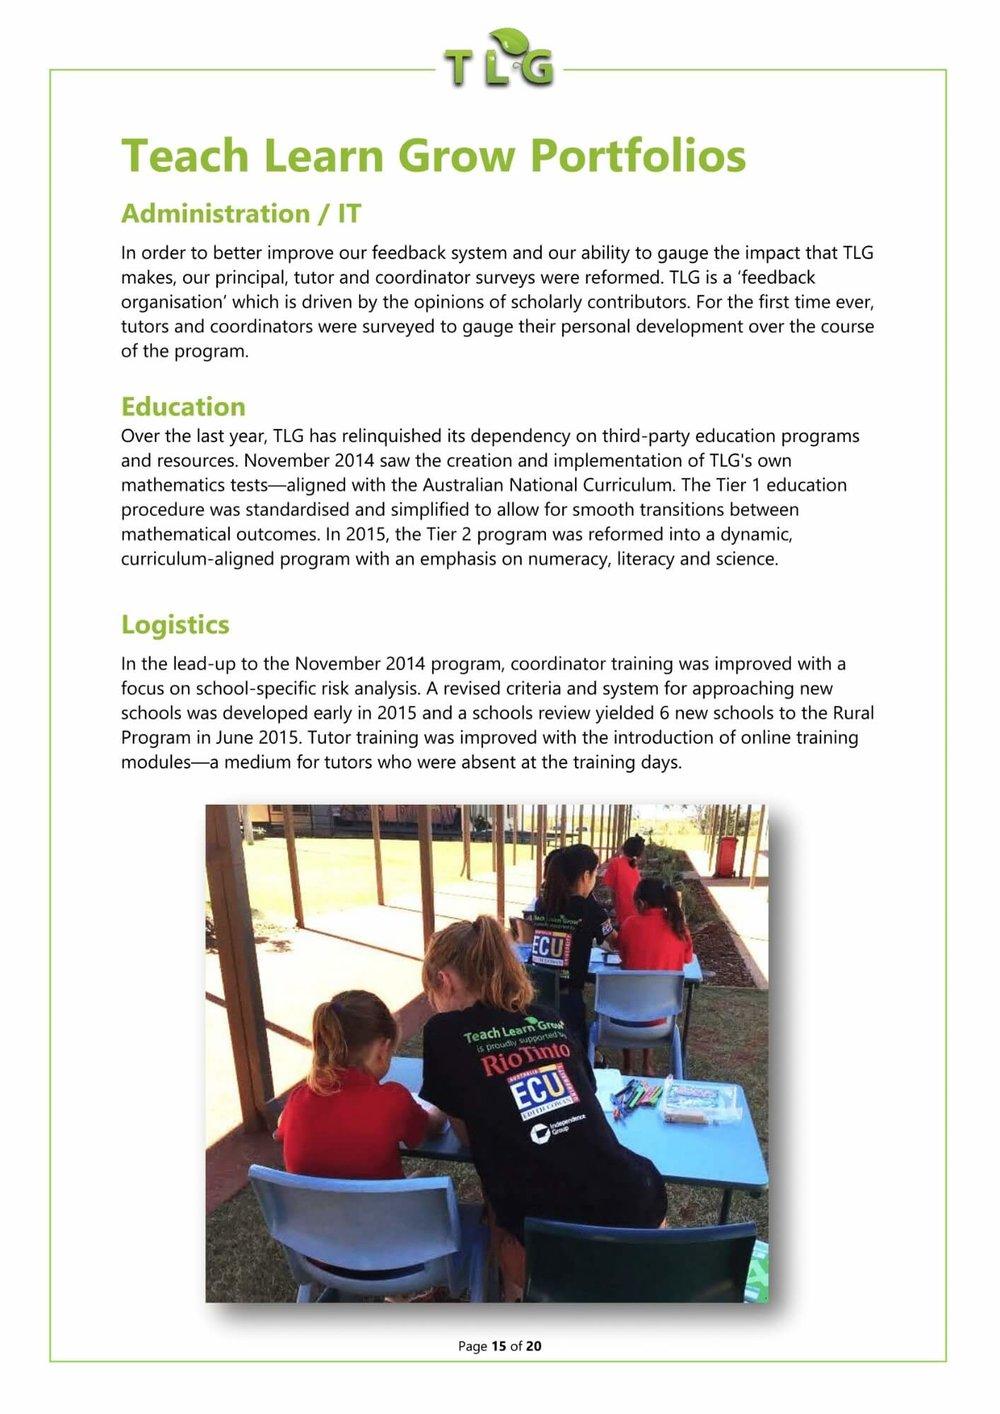 tlg-annual-report-FY14-15.jpg